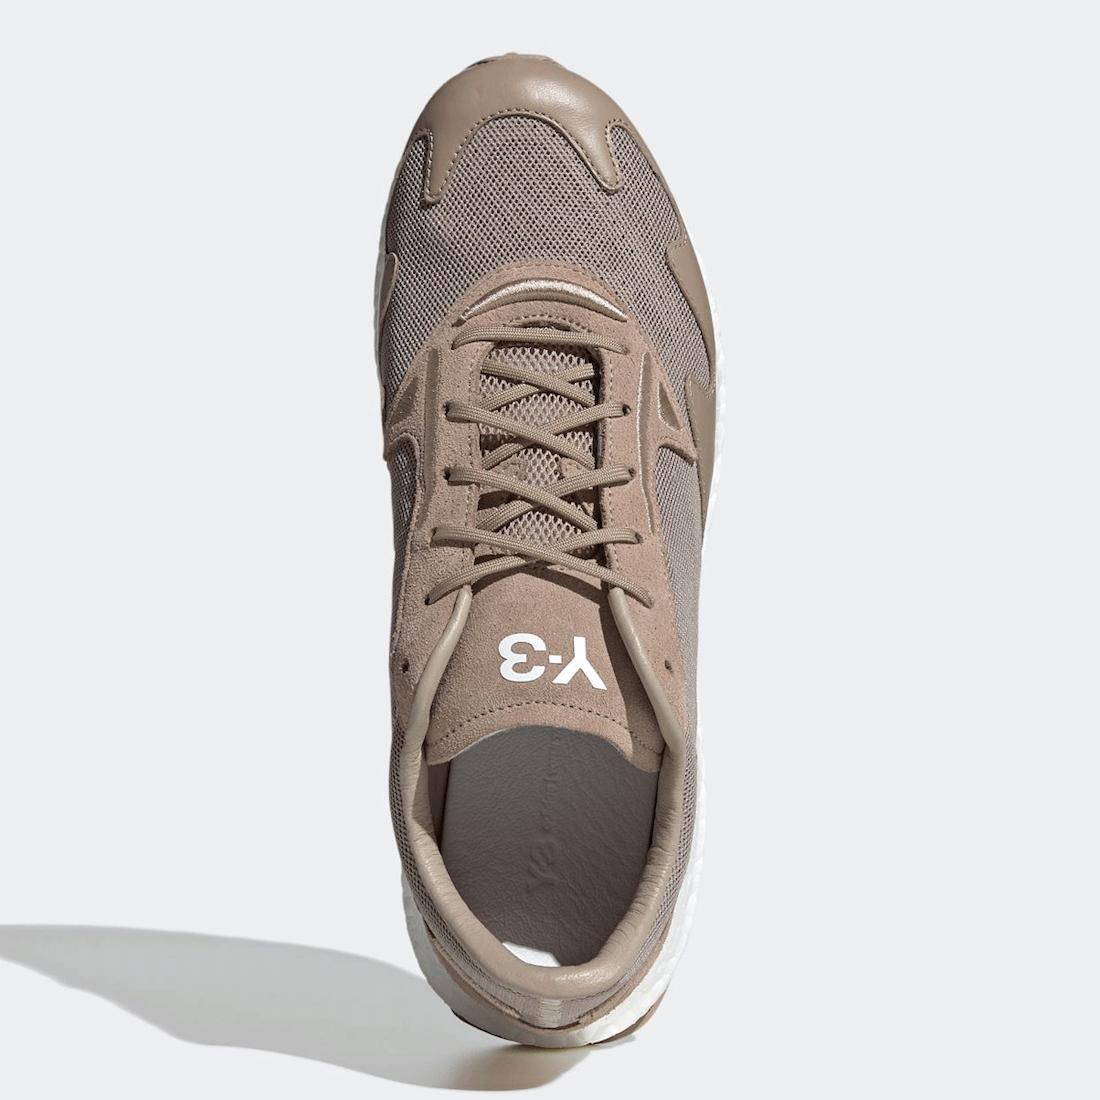 adidas Y-3 Rhisu Run Trace Khaki FX7262 Release Date Info